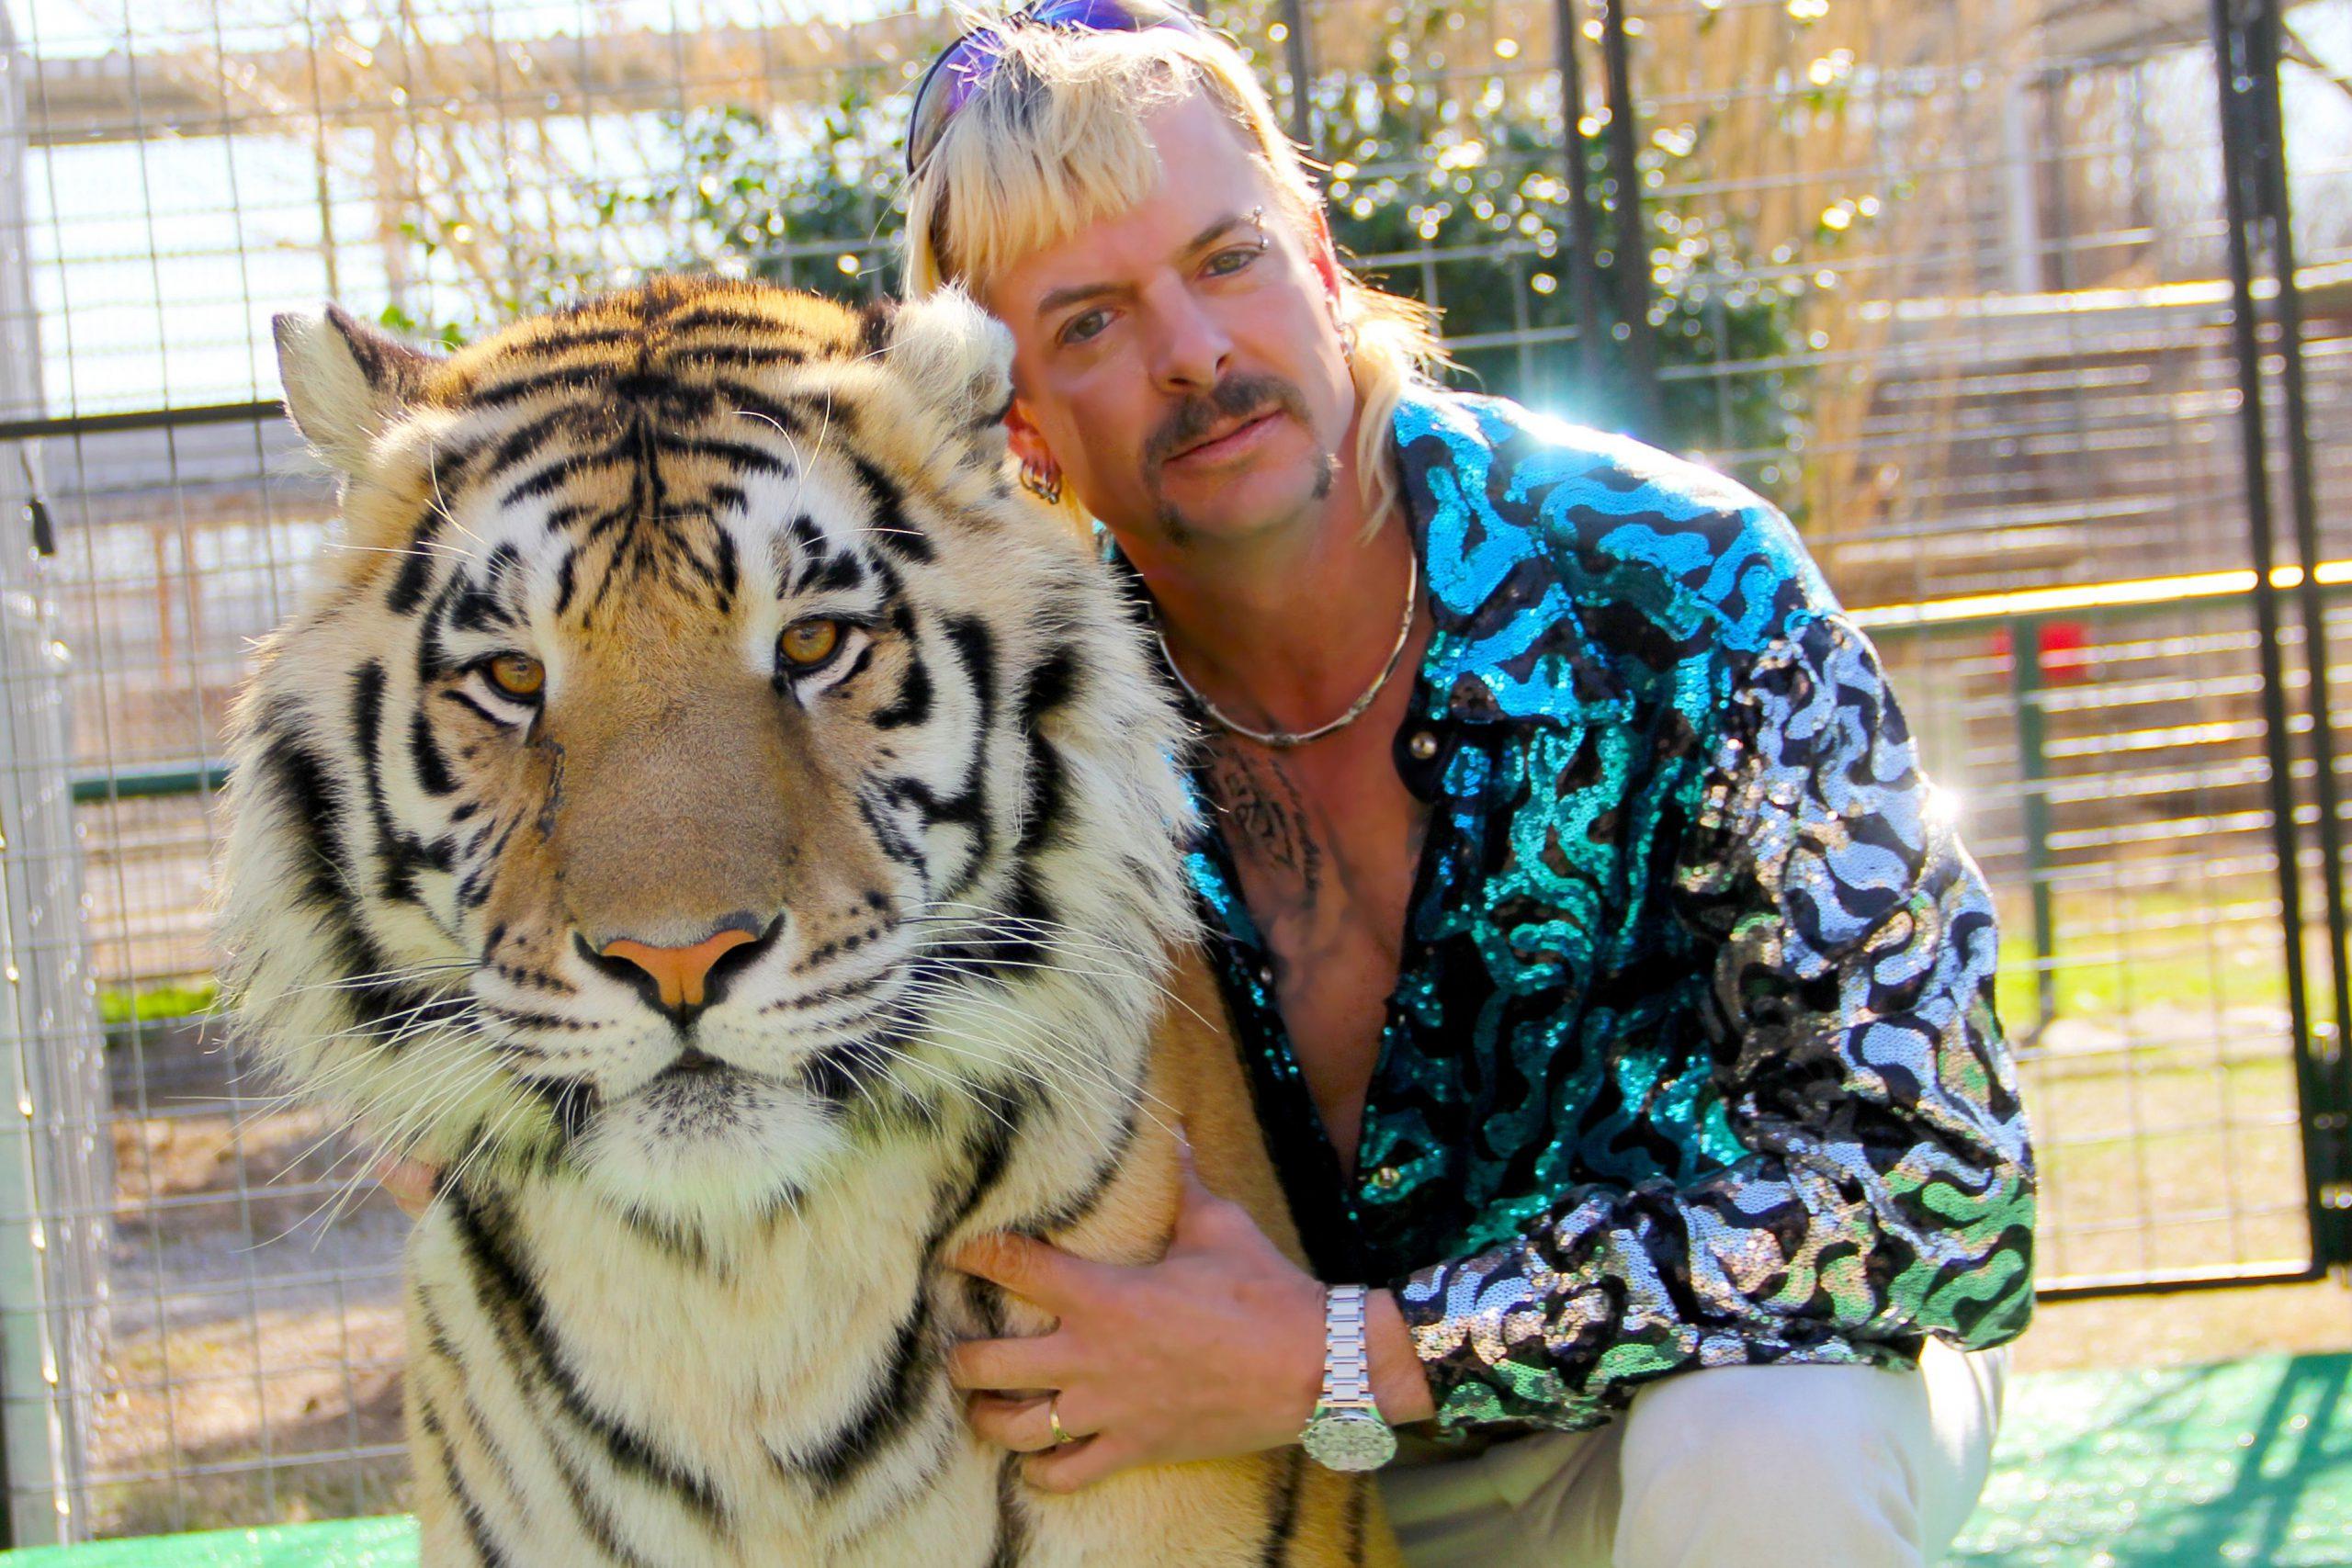 Tiger King - docuseries